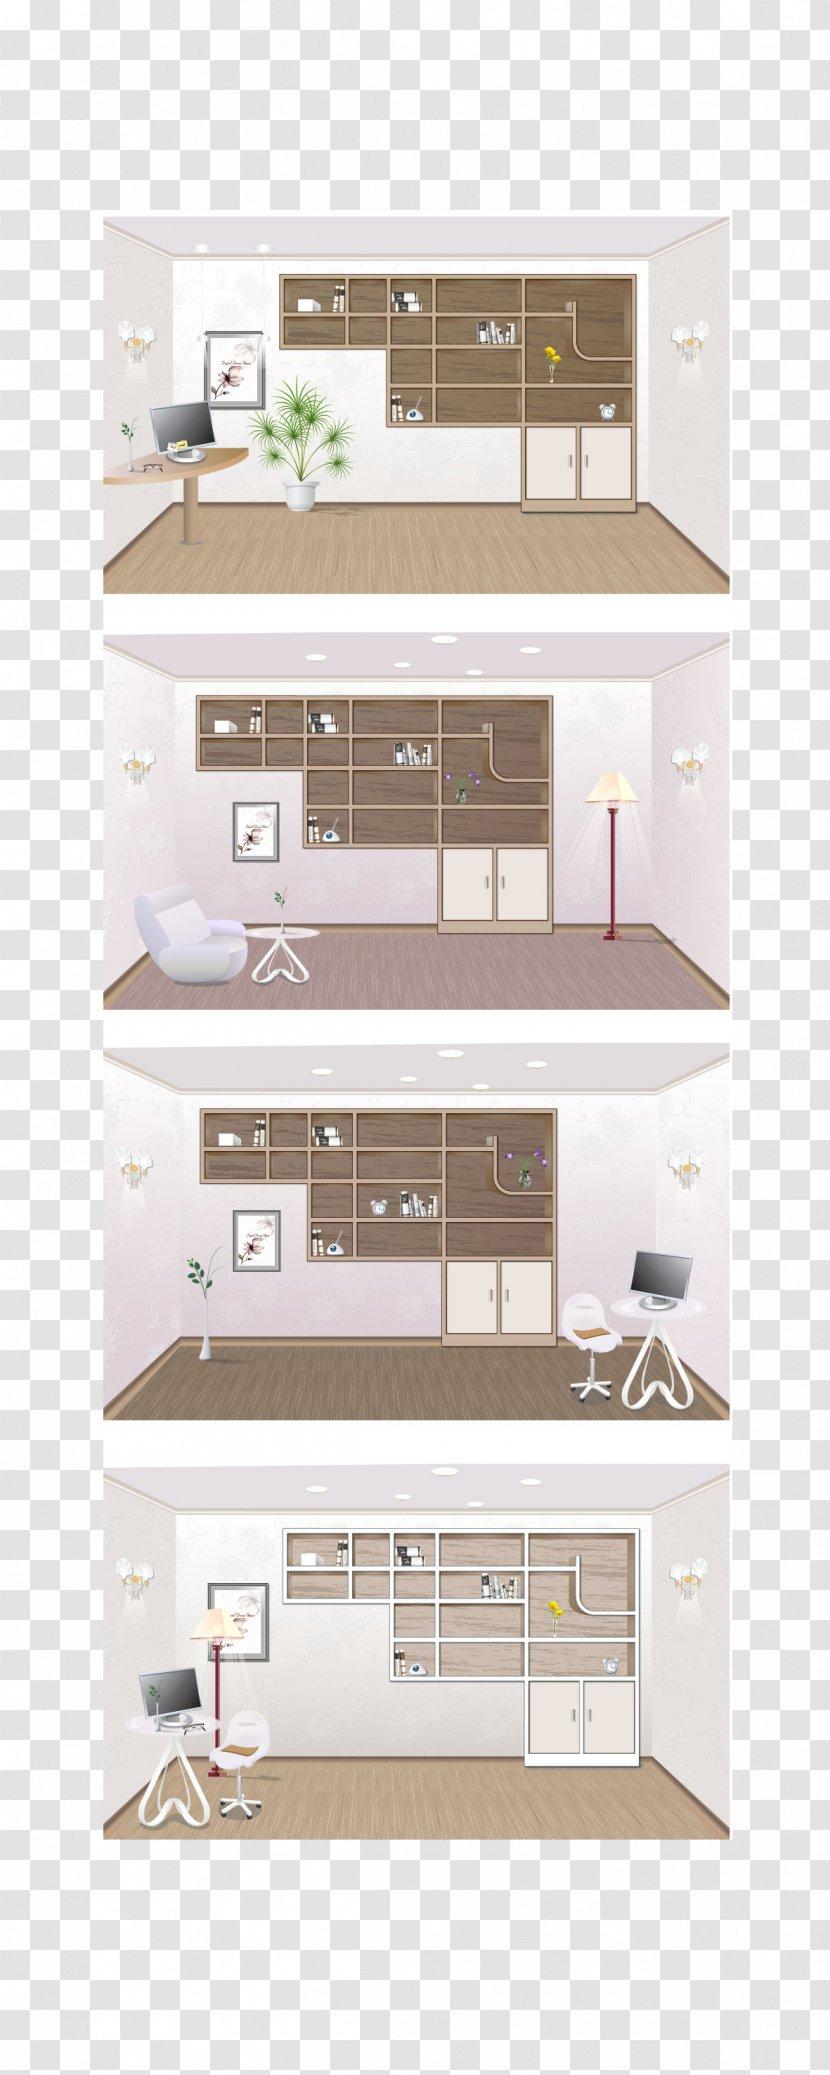 Interior Design Services Euclidean Vector Home Transparent Png